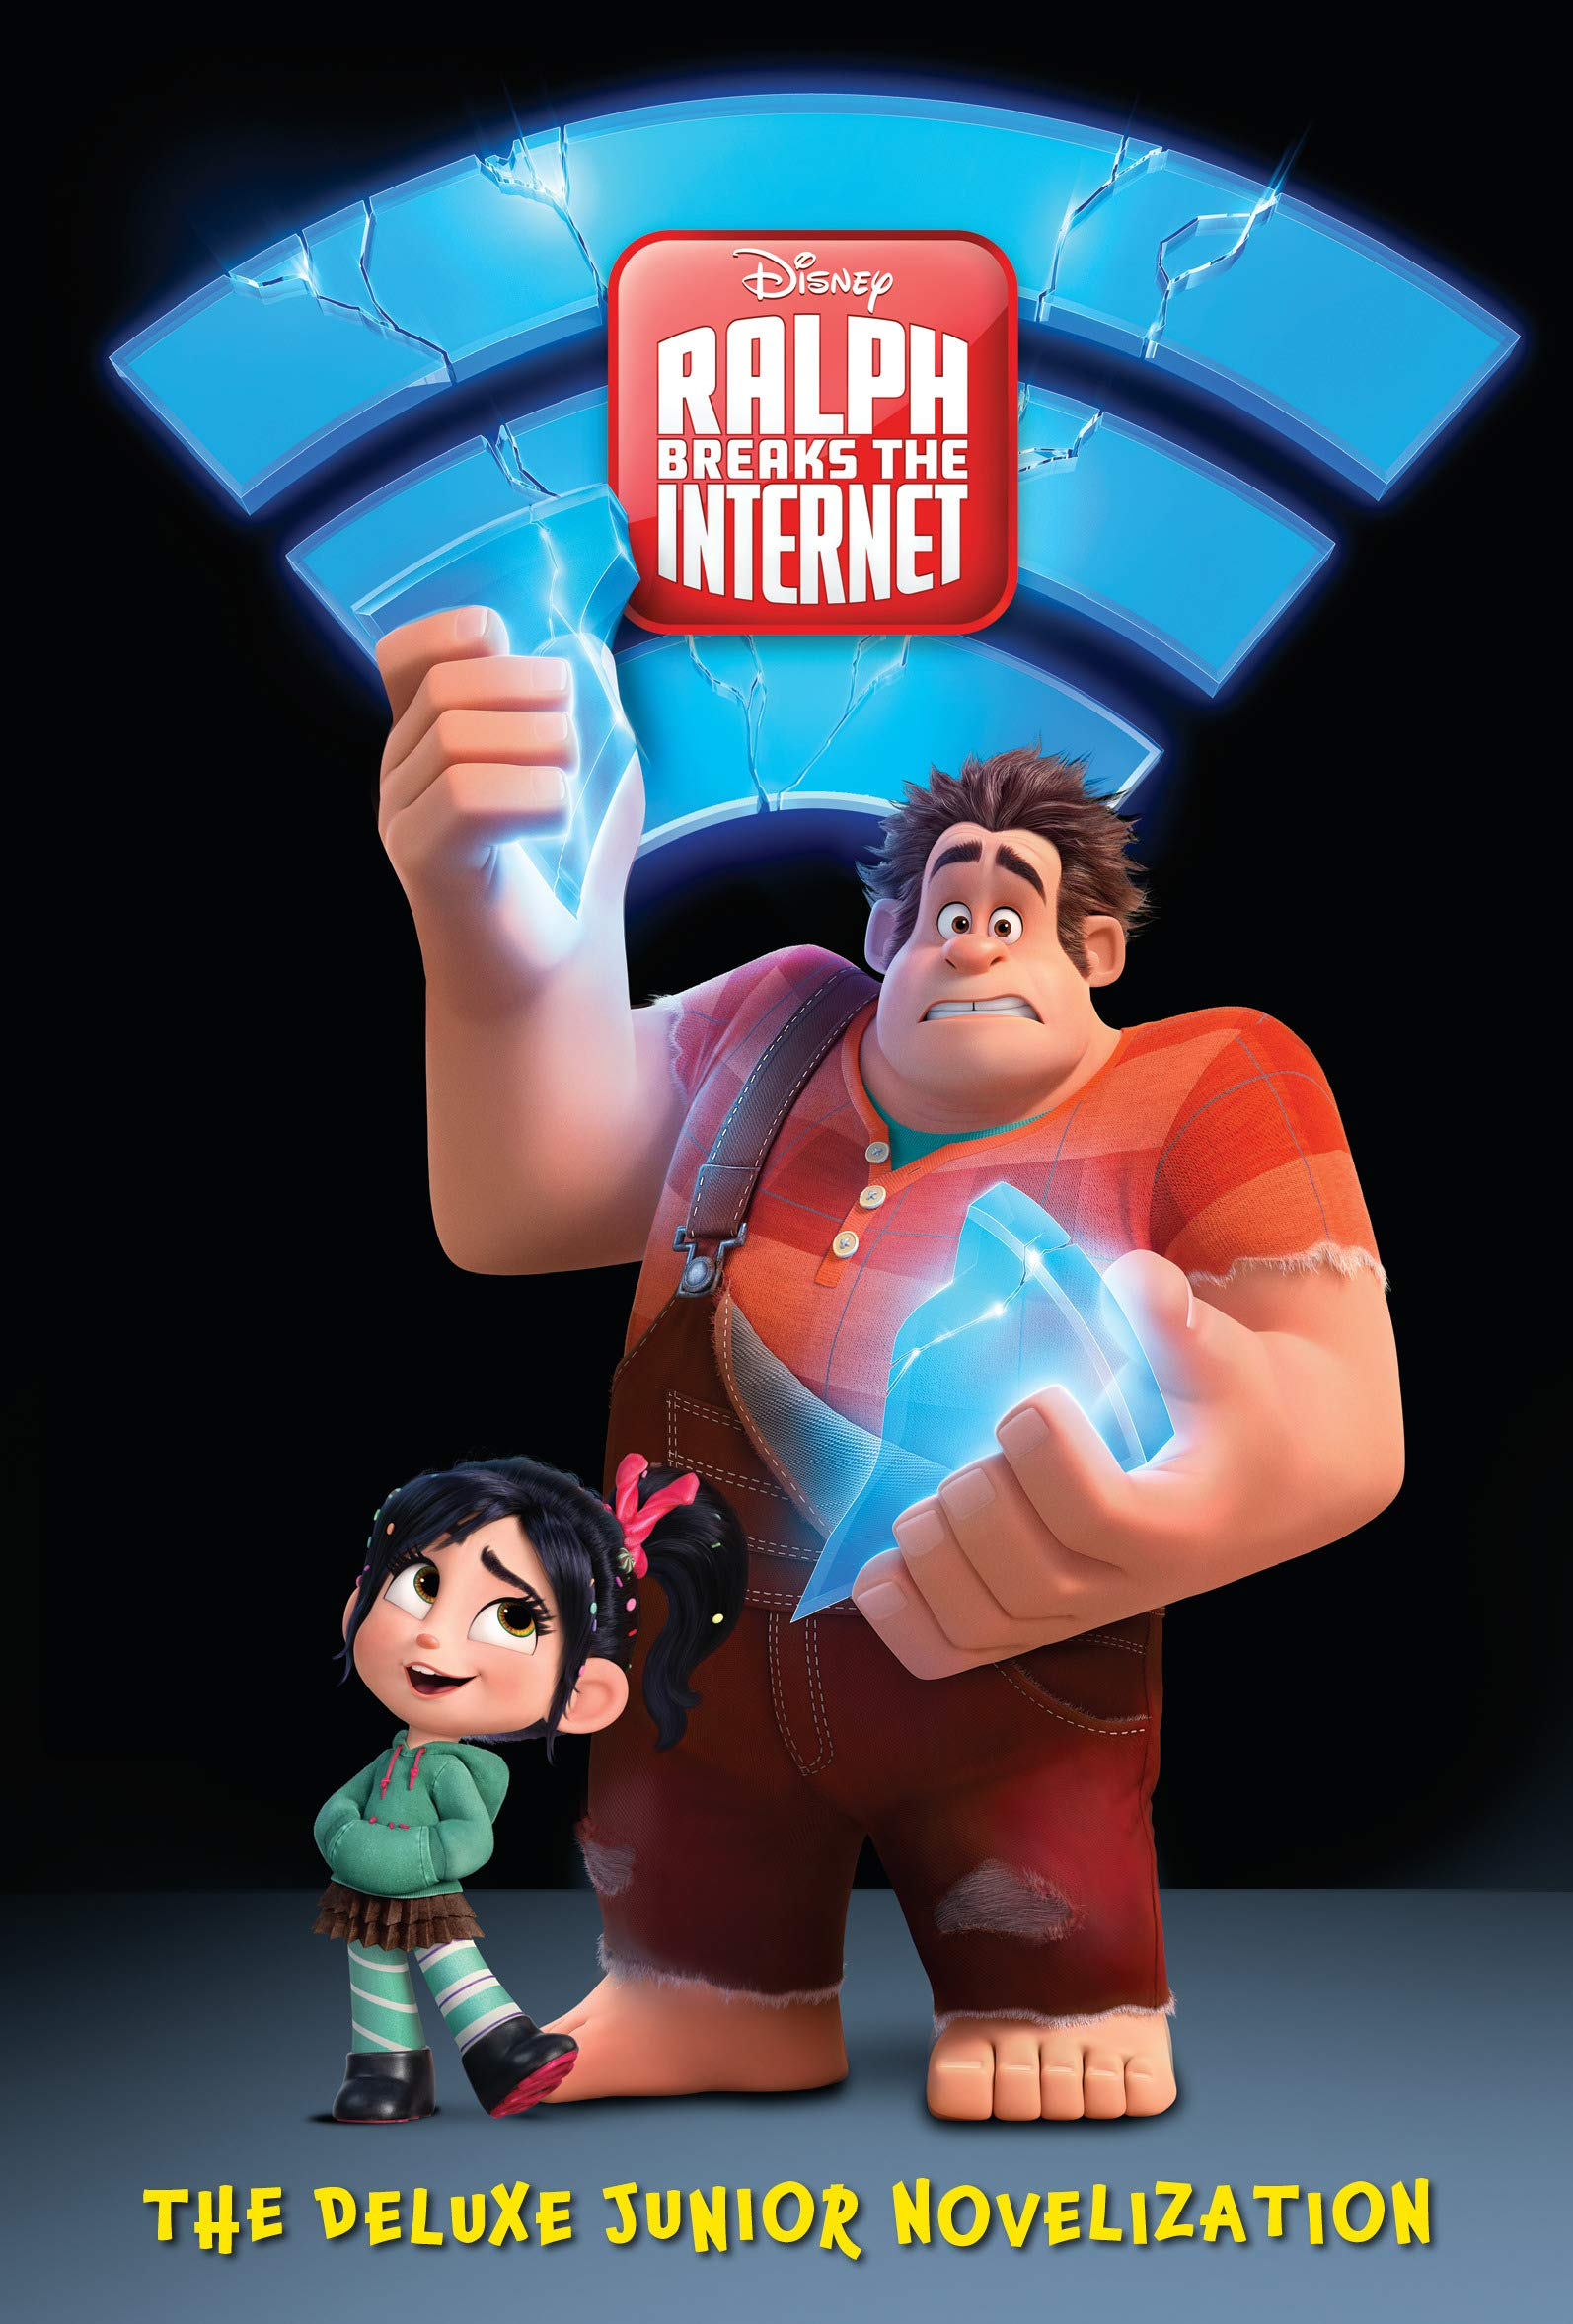 Ralph Breaks The Internet The Deluxe Junior Novelization Disney Wreck It Ralph 2 Rh Disney Rh Disney 9780736437622 Amazon Com Books